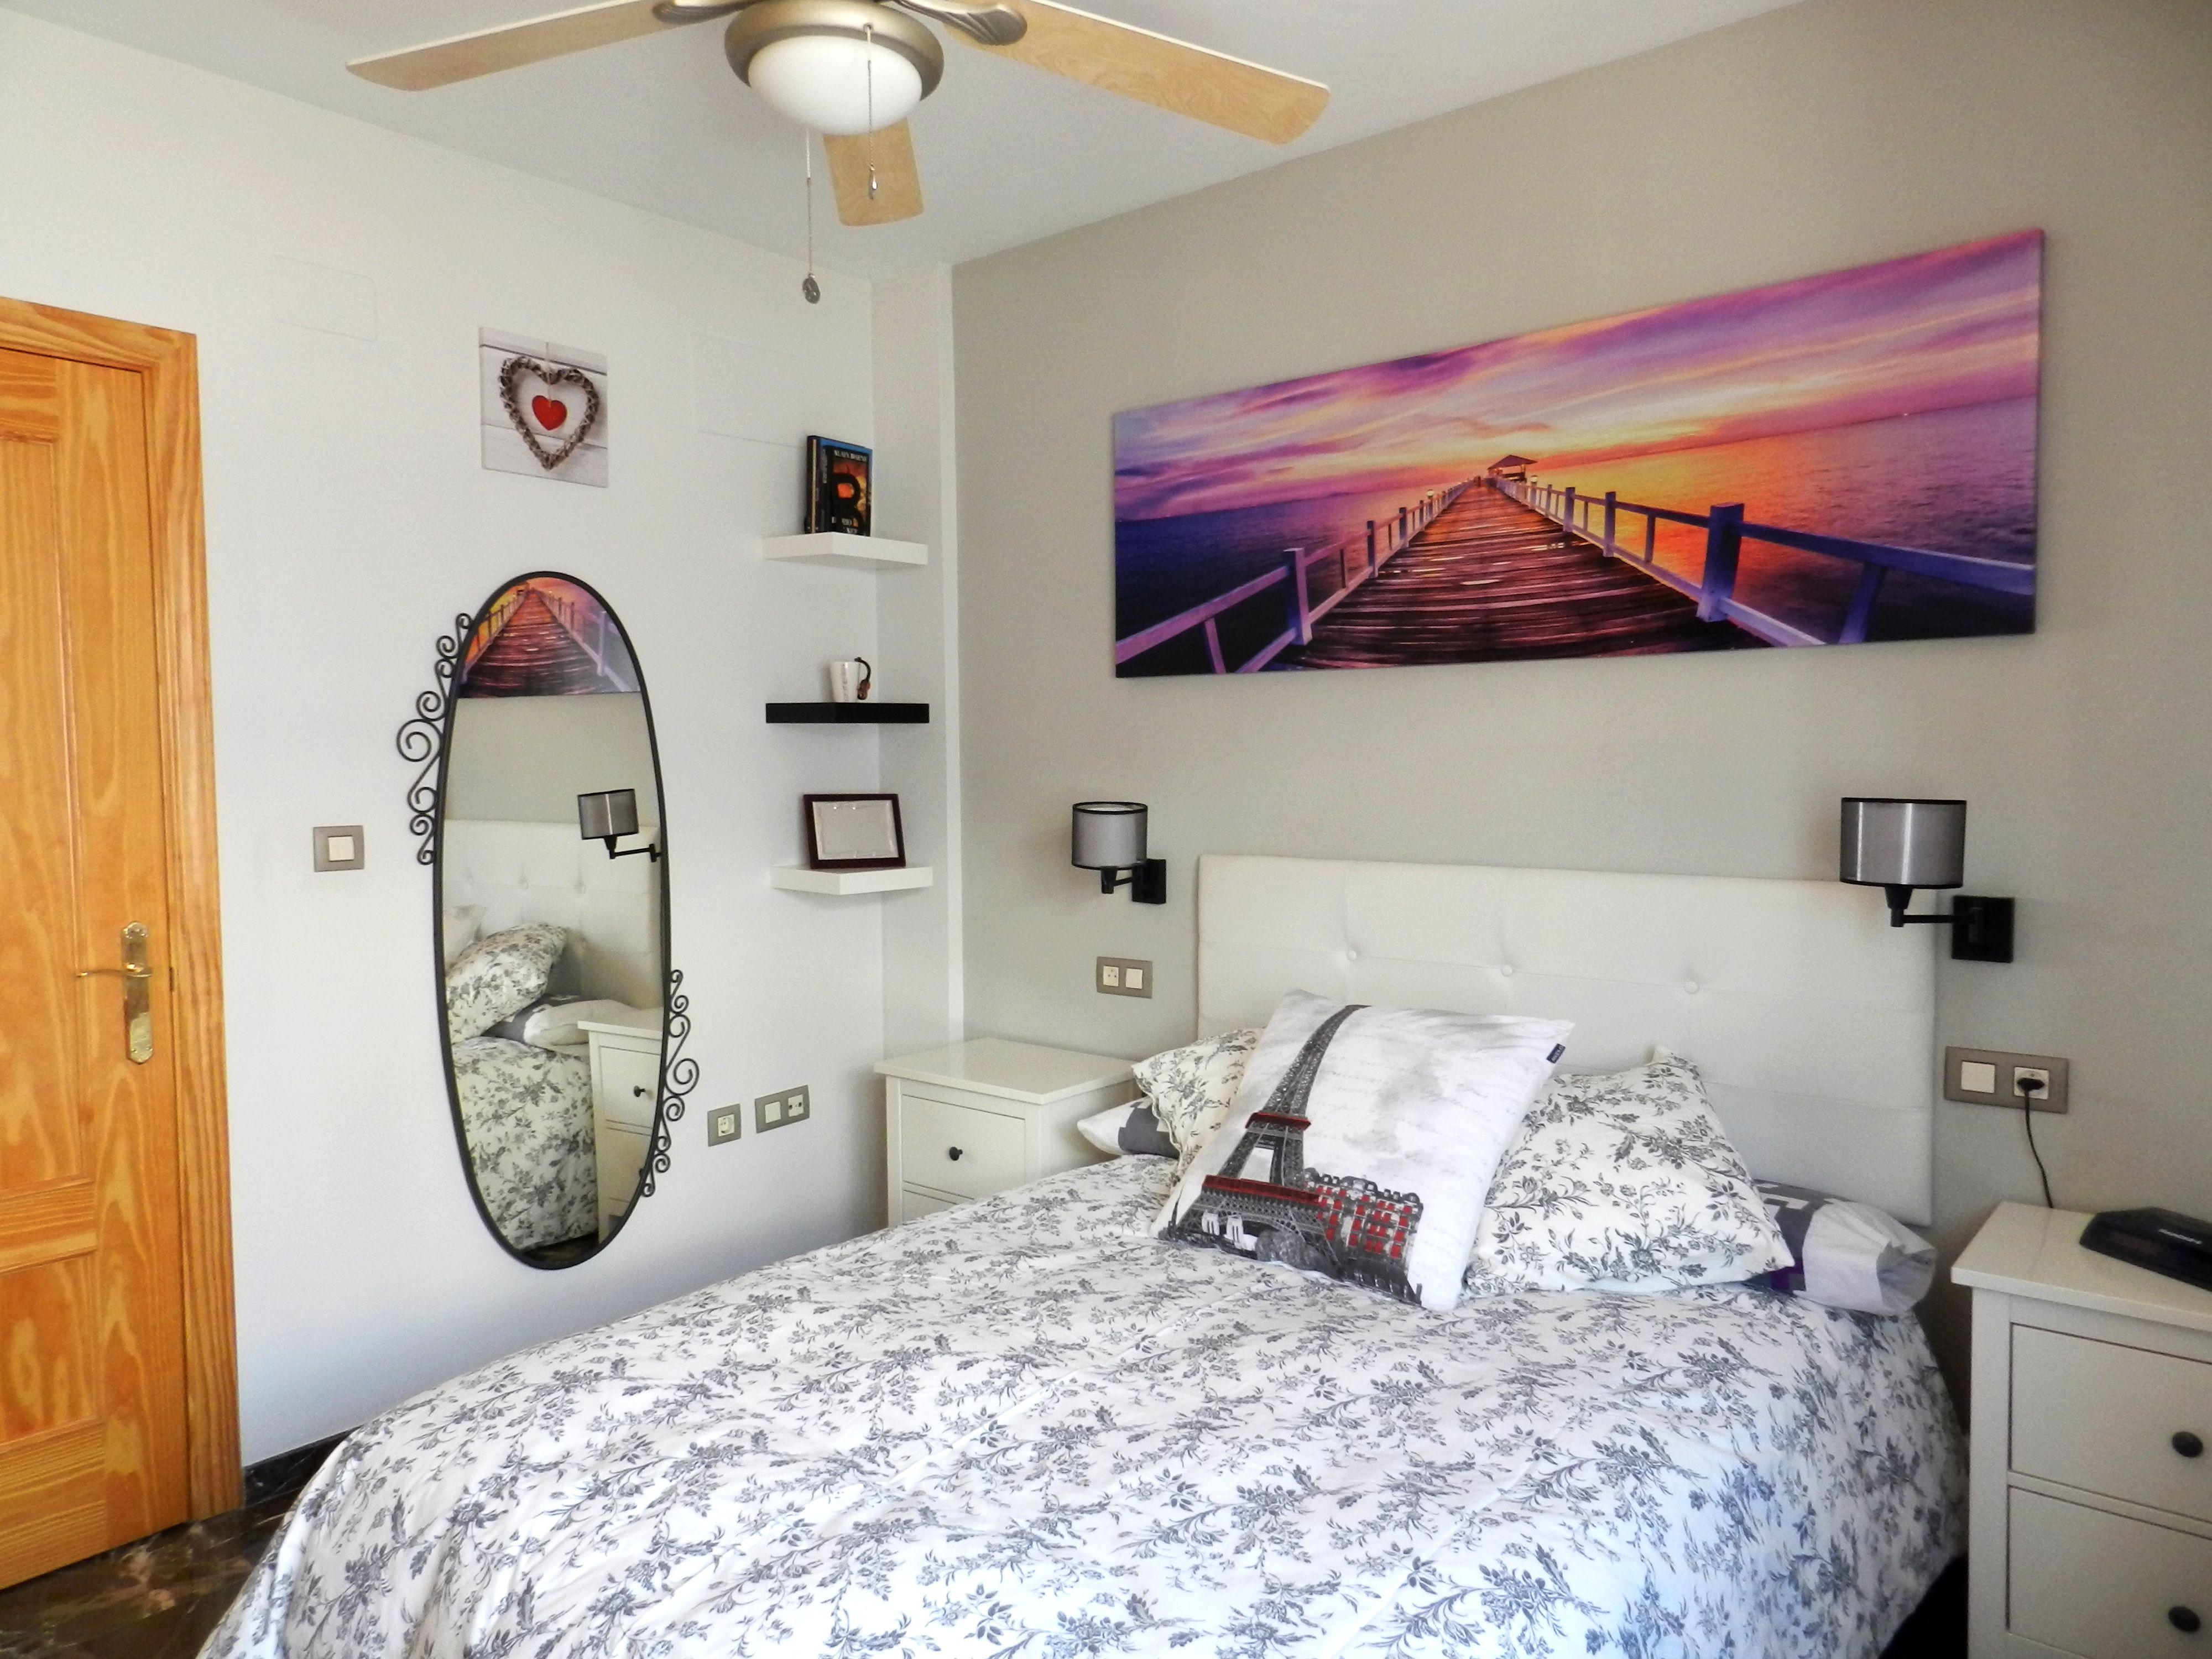 Residencia popular con wi-fi